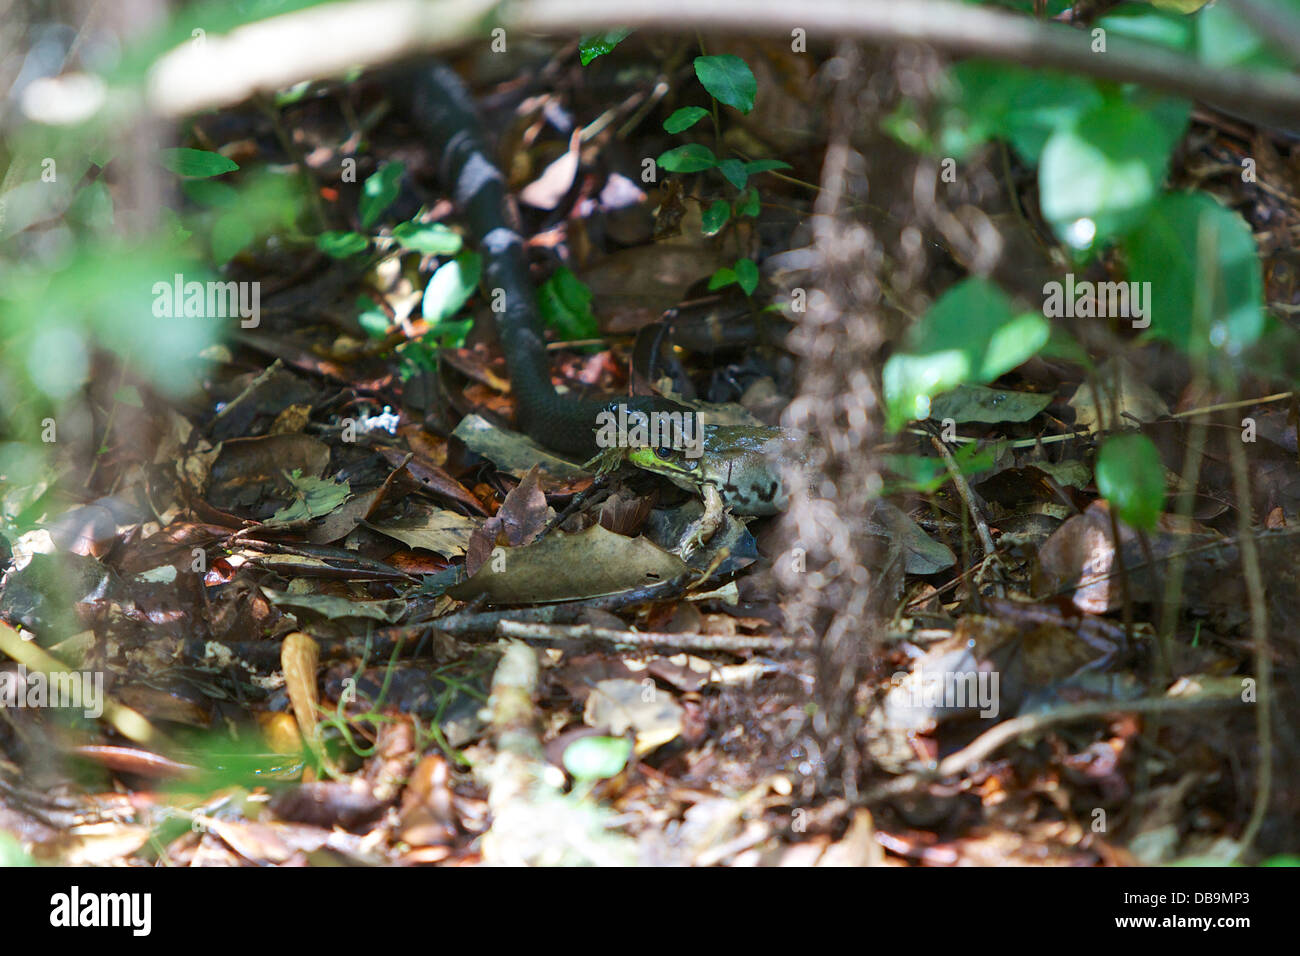 Black Racer snake with a recently caught frog, Audubon Swamp Garden, Charleston, South Carolina - Stock Image